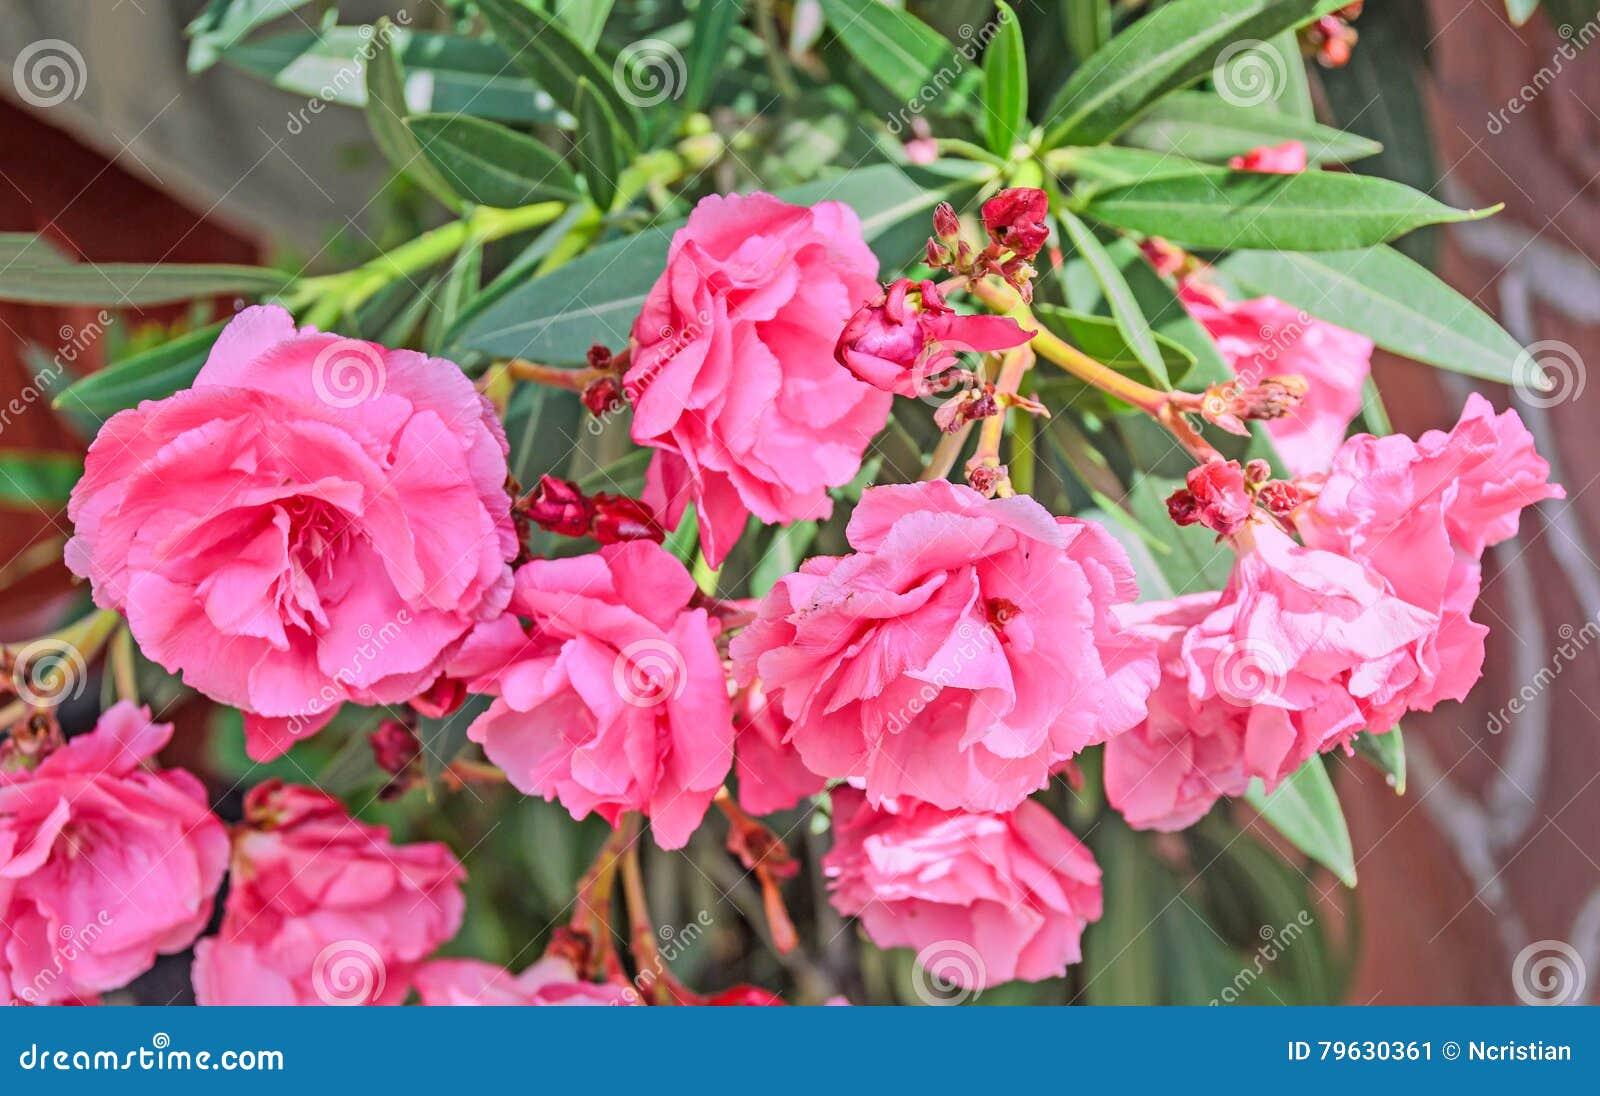 Pink Flowers Of Nerium Oleander Evergreen Shrub Family Apocynaceae